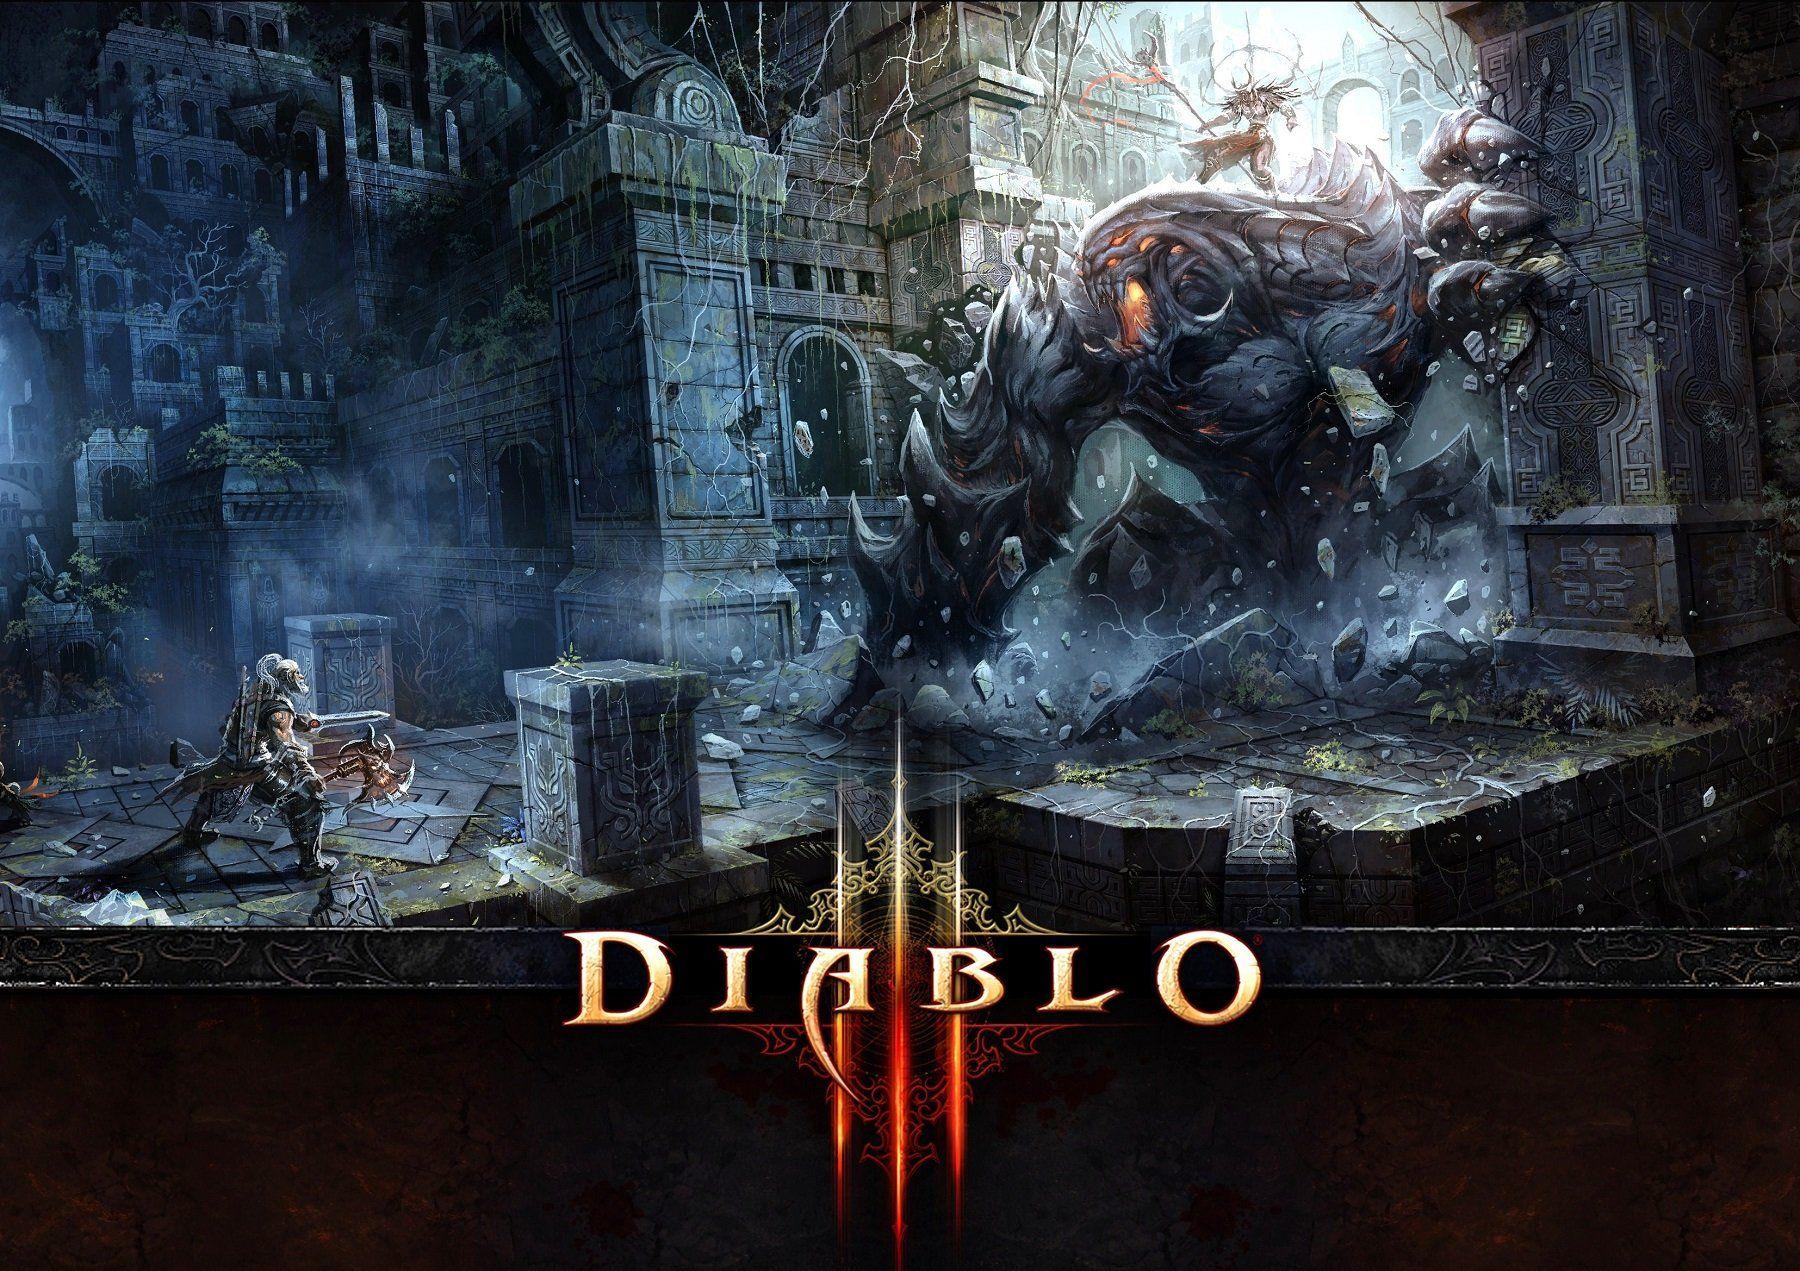 Diablo III Poster Video game posters, Art prints online